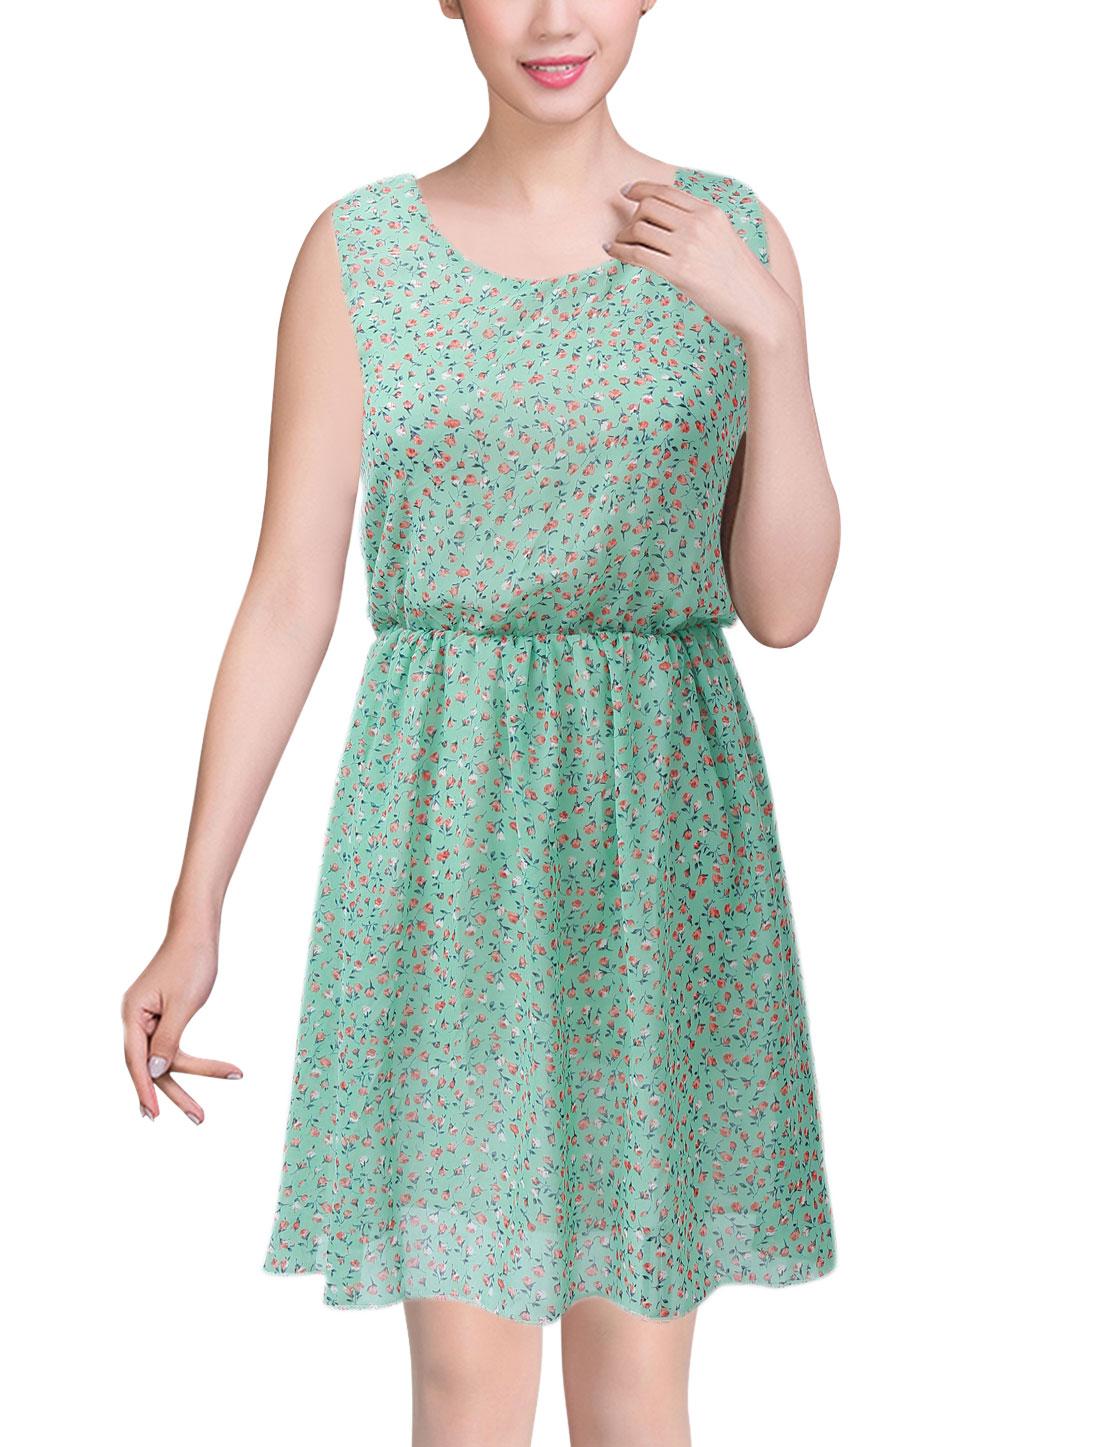 Ladies Round Neck Floral Prints Elastic Waist Casual Sundress Mint XS